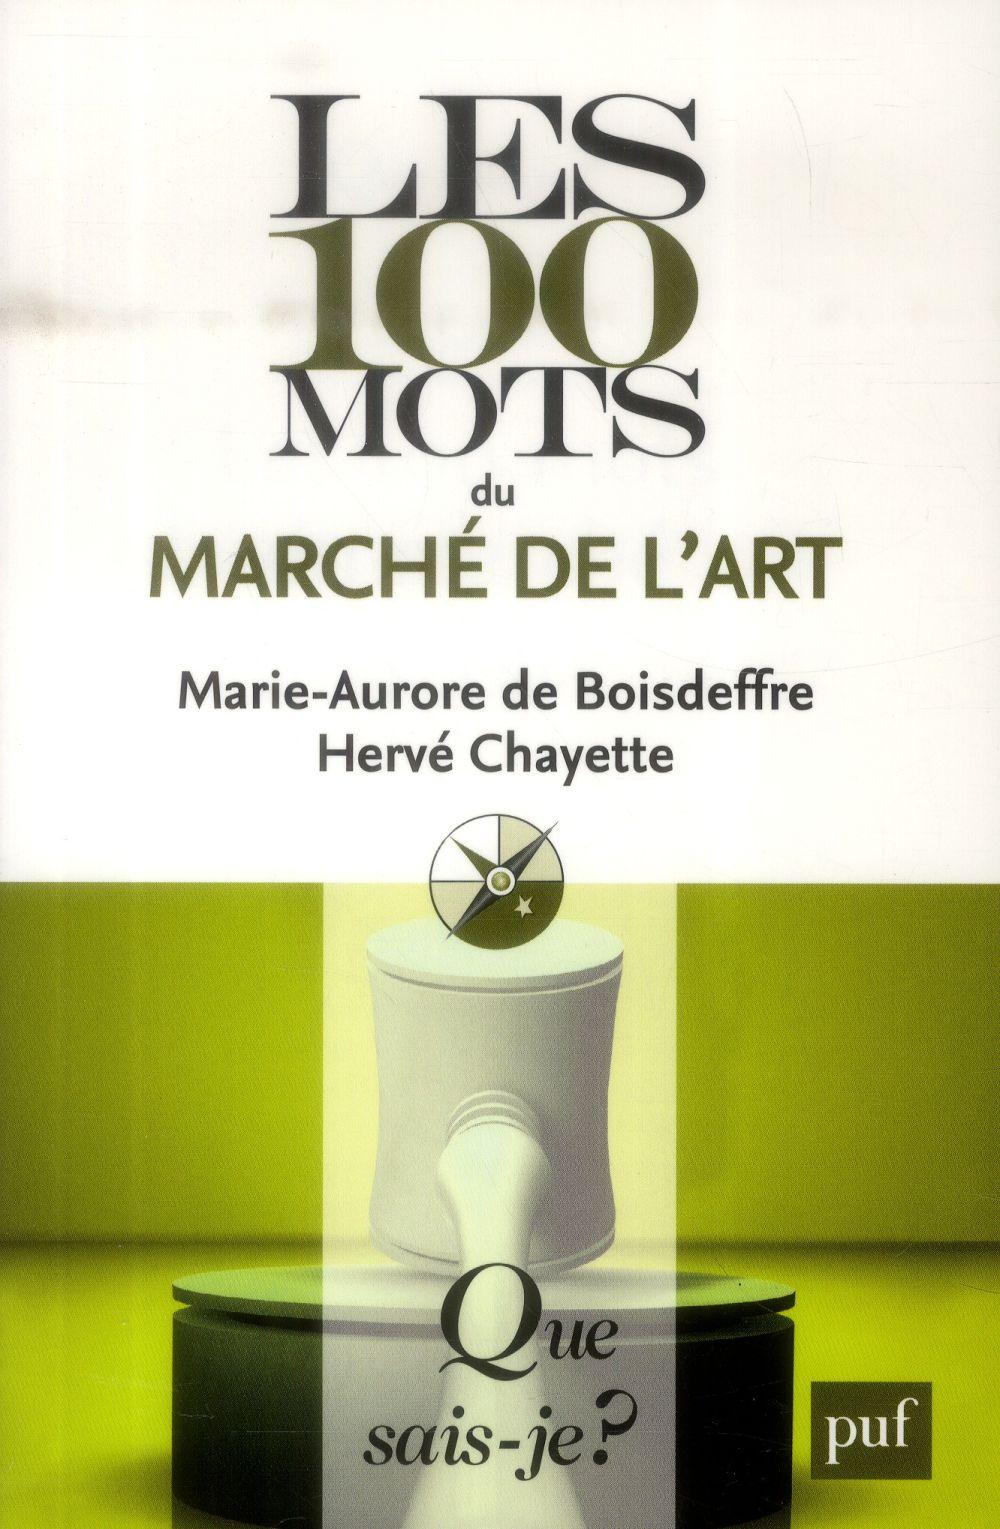 LES 100 MOTS DU MARCHE DE L'ART QSJ 3883